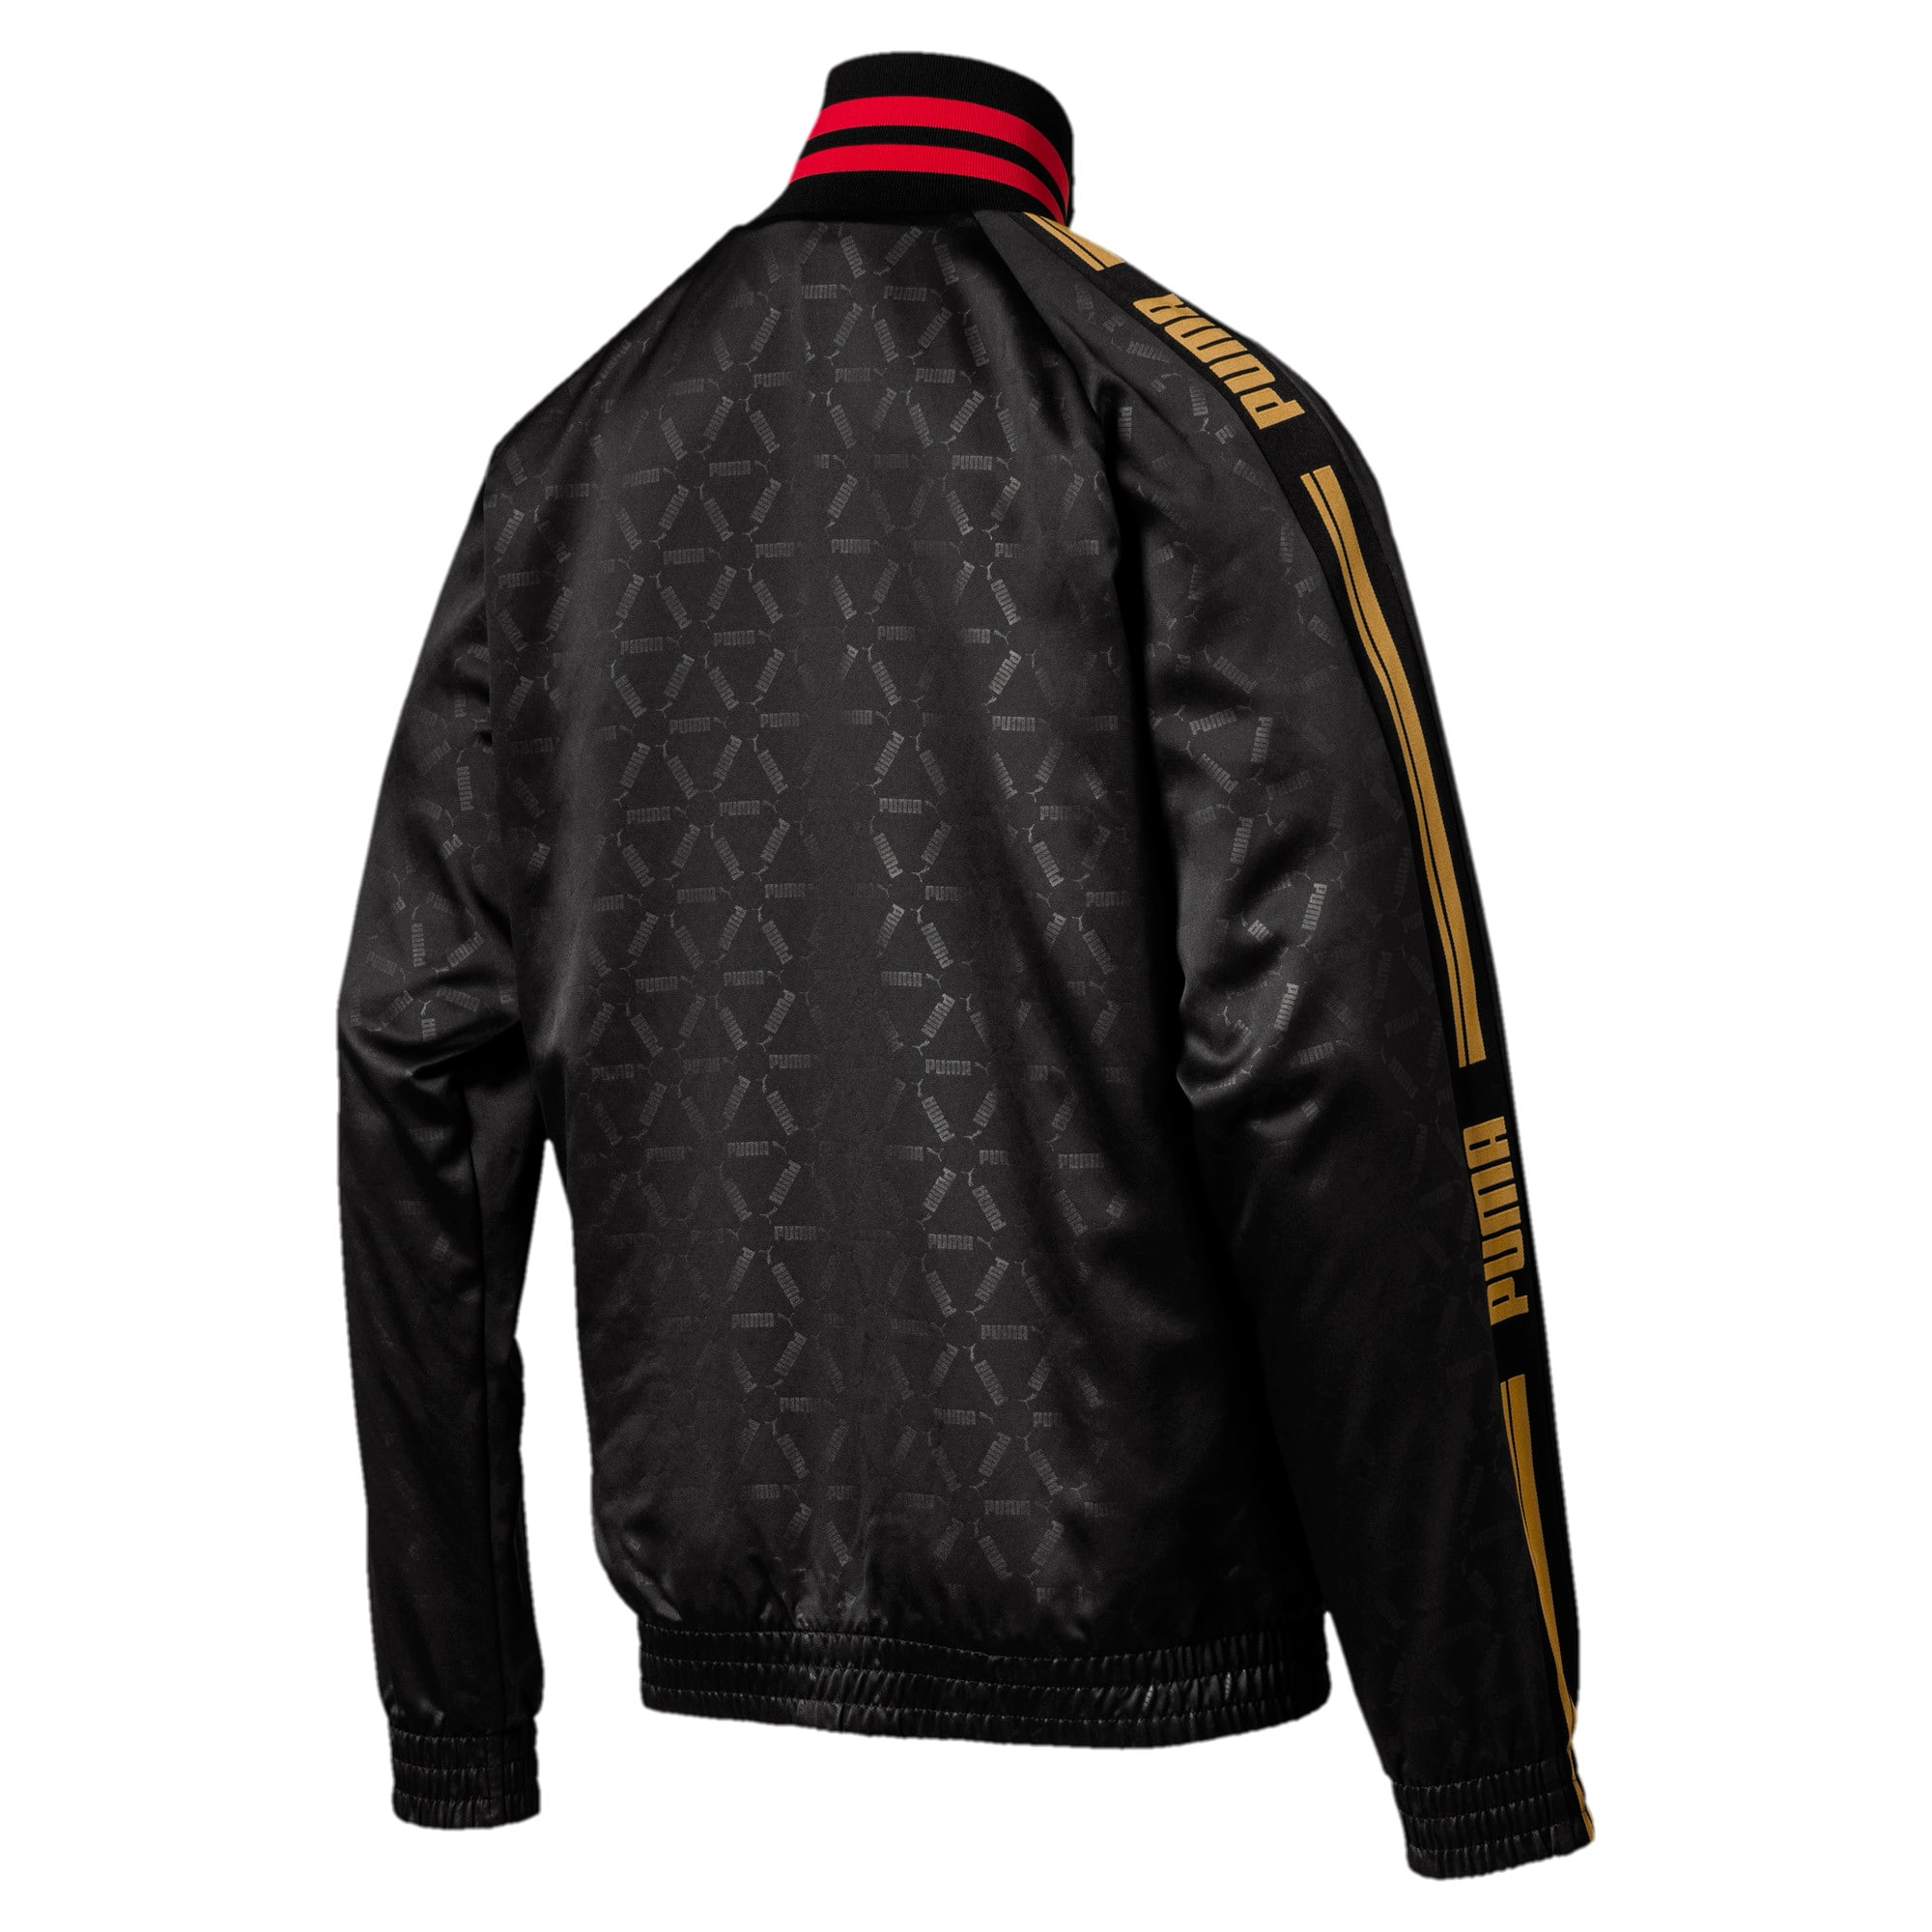 Thumbnail 4 of LUXE PACK Track Jacket, Puma Black-AOP, medium